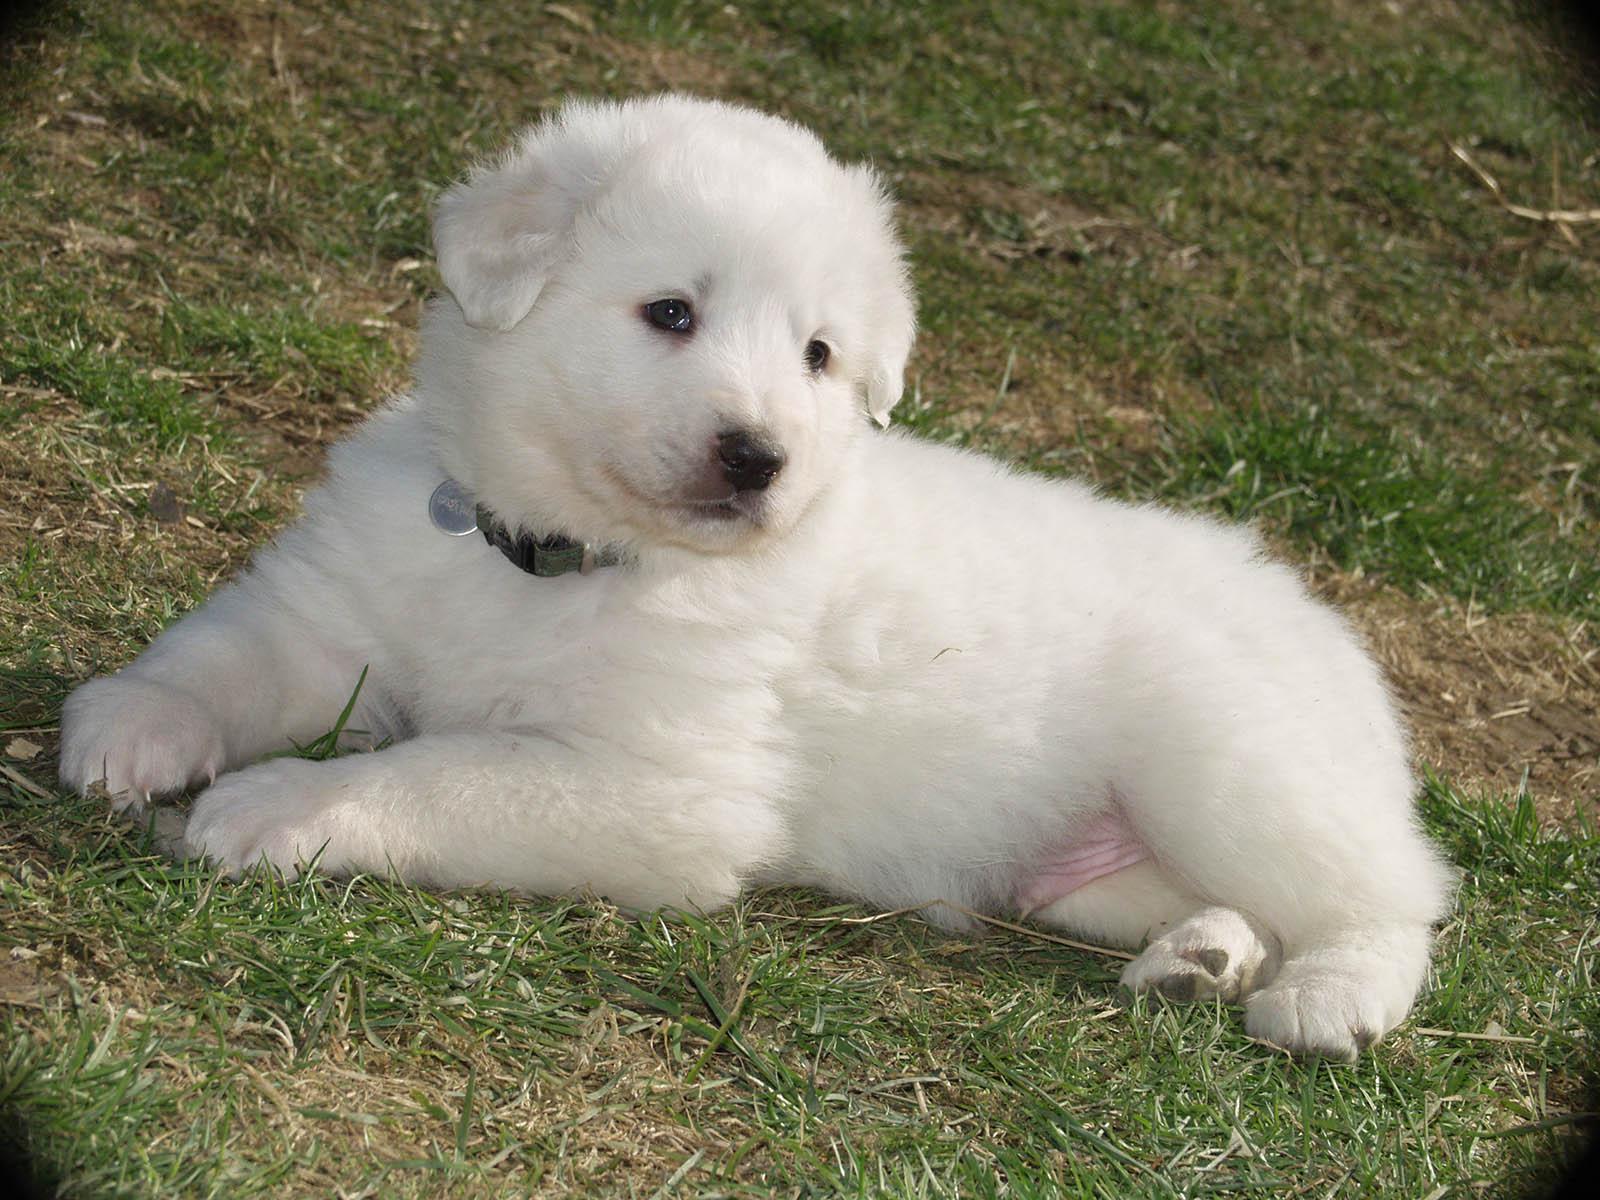 un cucciolo di pastore maremmano